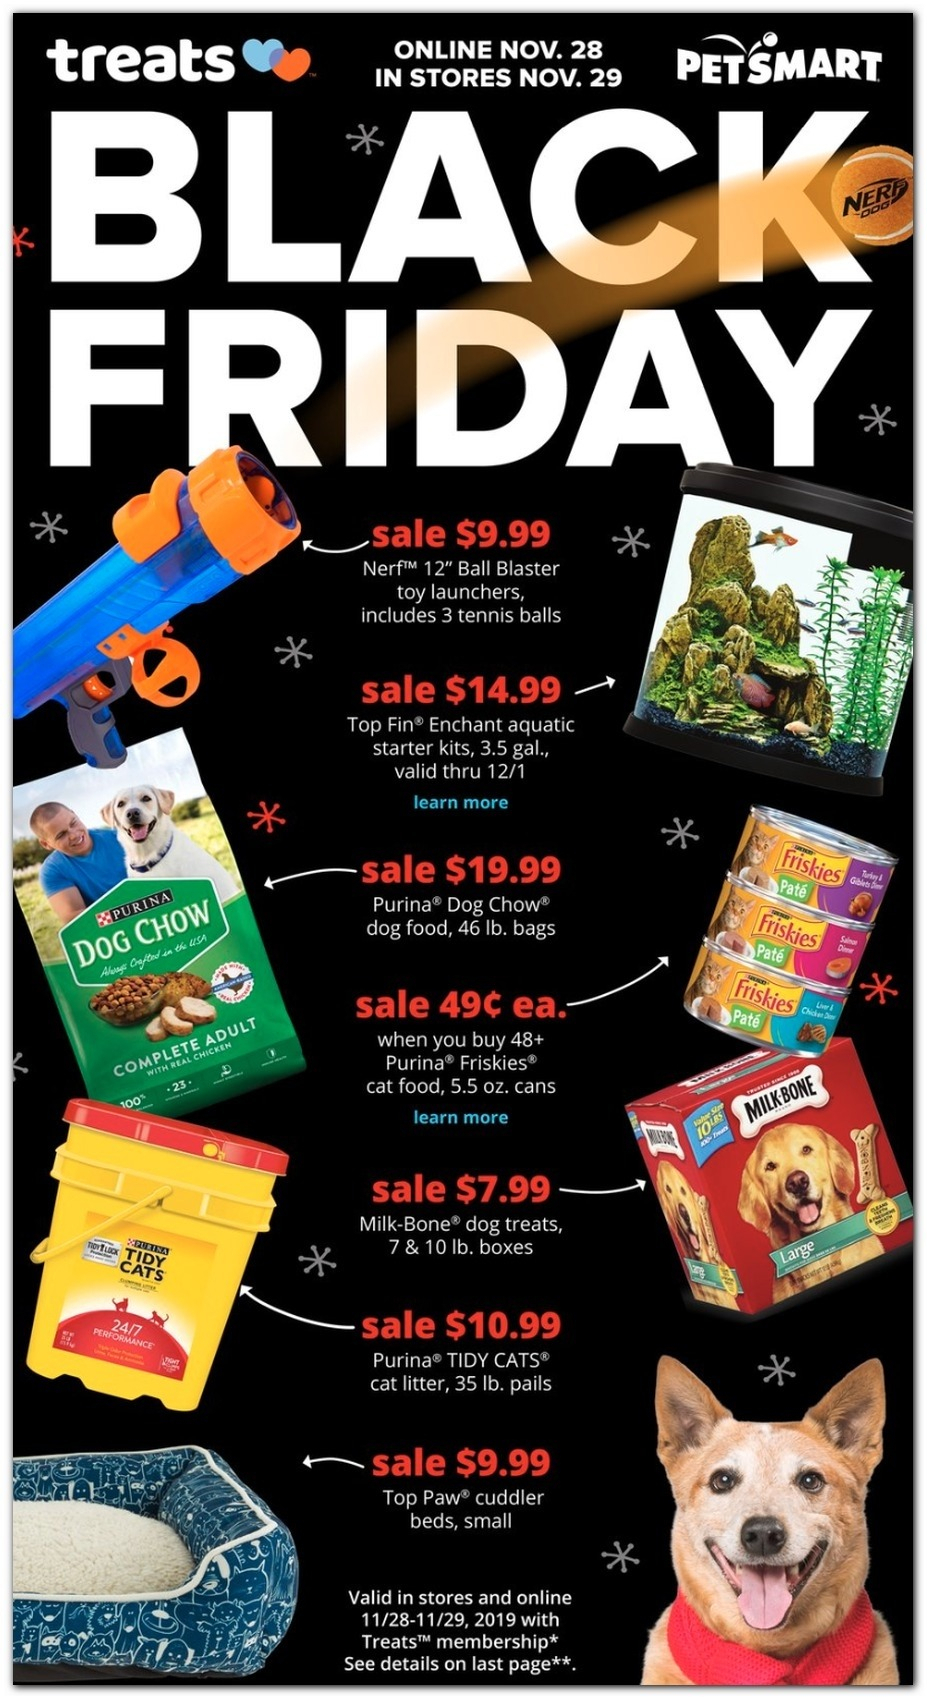 PetSmart Black Friday 2020 Ad